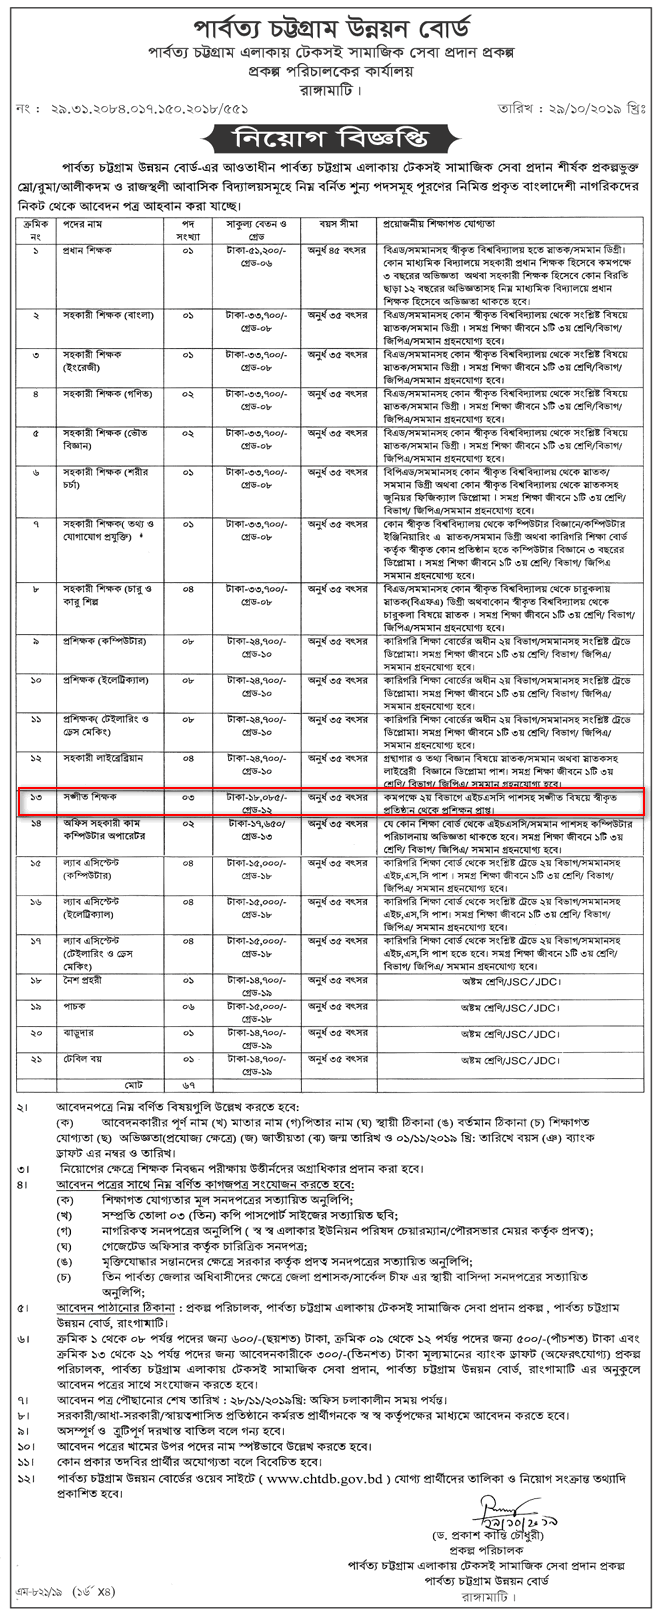 Govt Primary School Singer and Sports Teacher Job Circular 2020